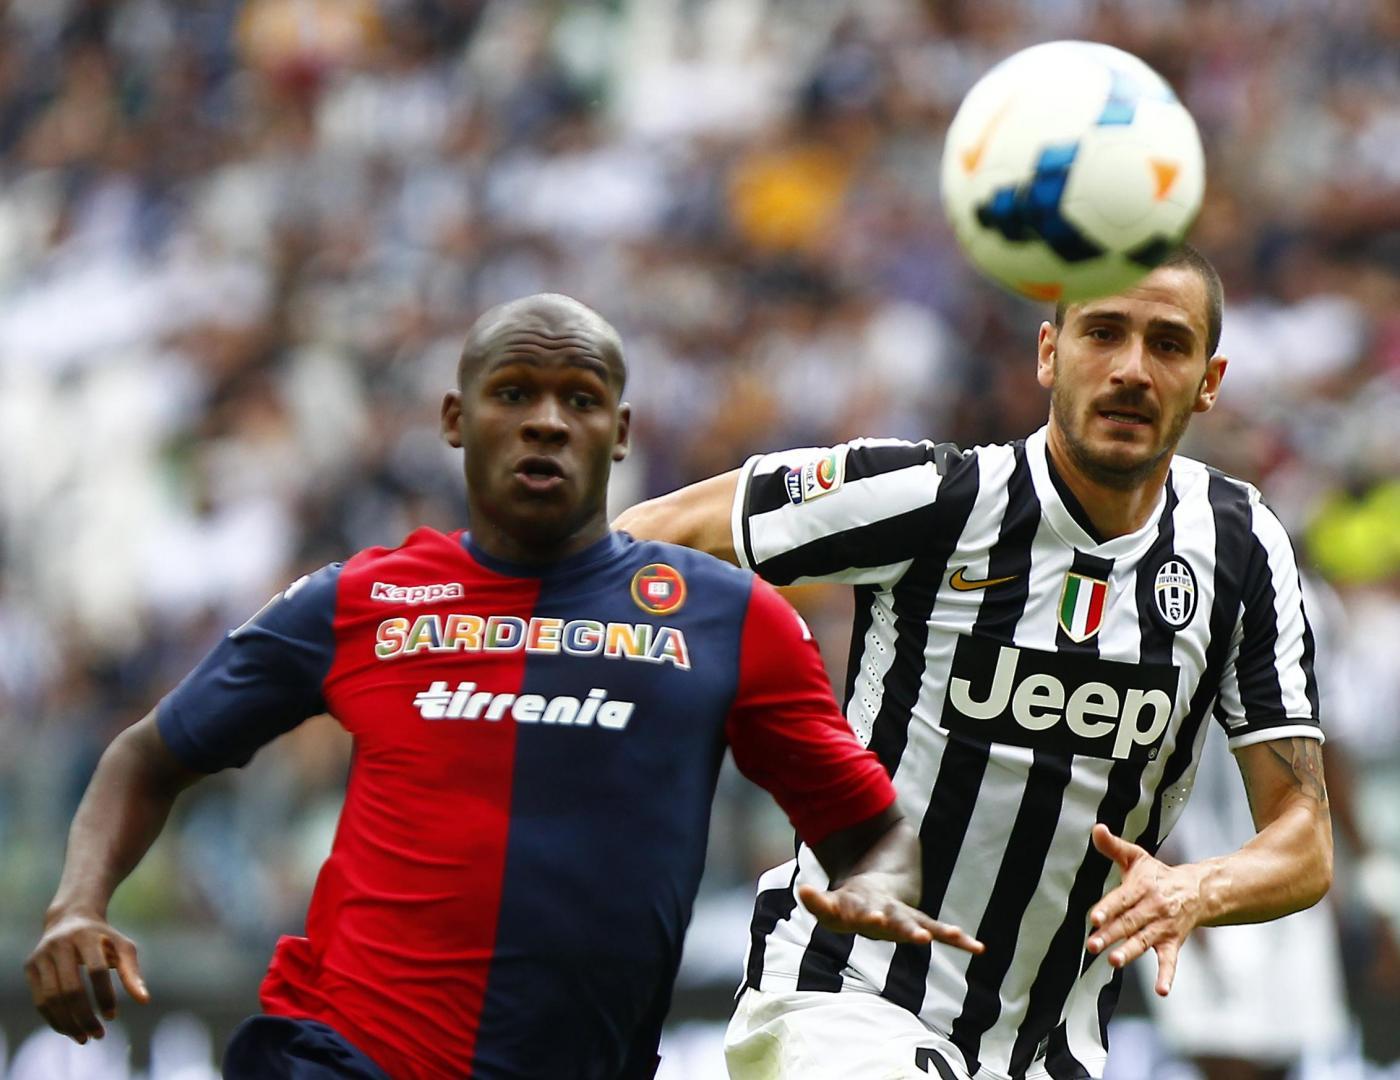 Cagliari vs Juventus 1-3: Zeman travolto